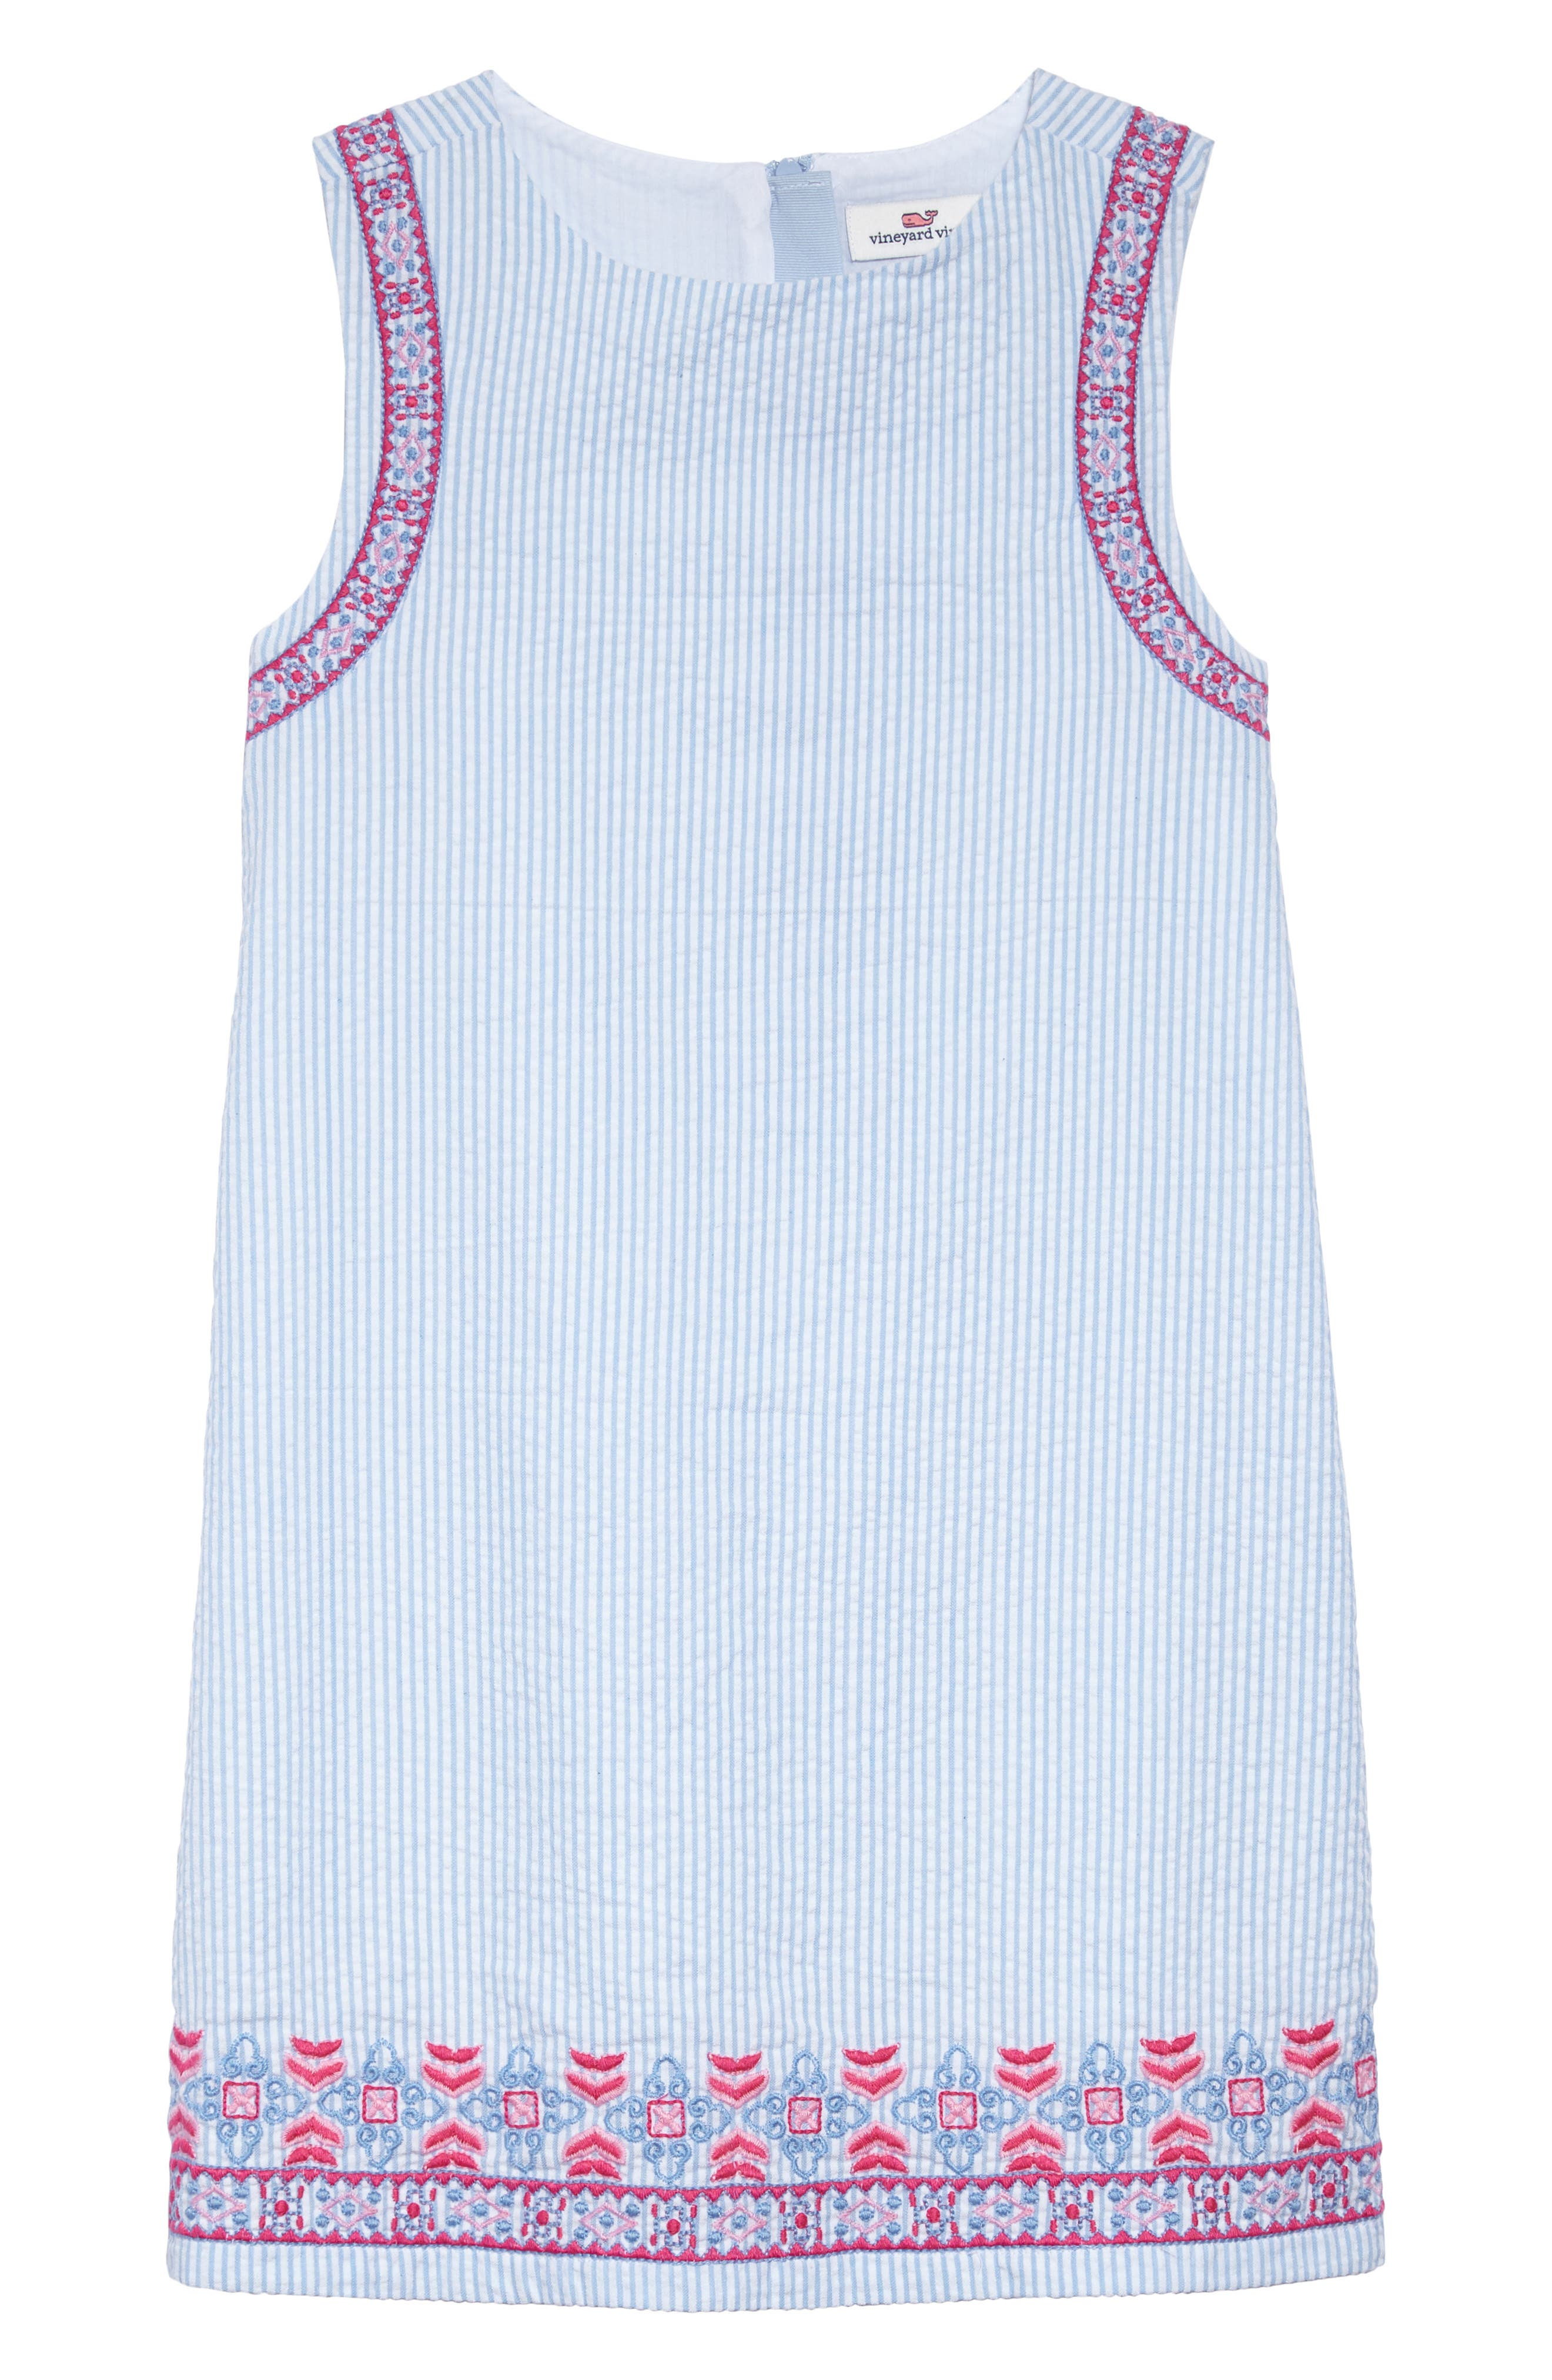 vineyard vines Embroidered Seersucker Shift Dress (Toddler Girls, Little Girls & Big Girls)